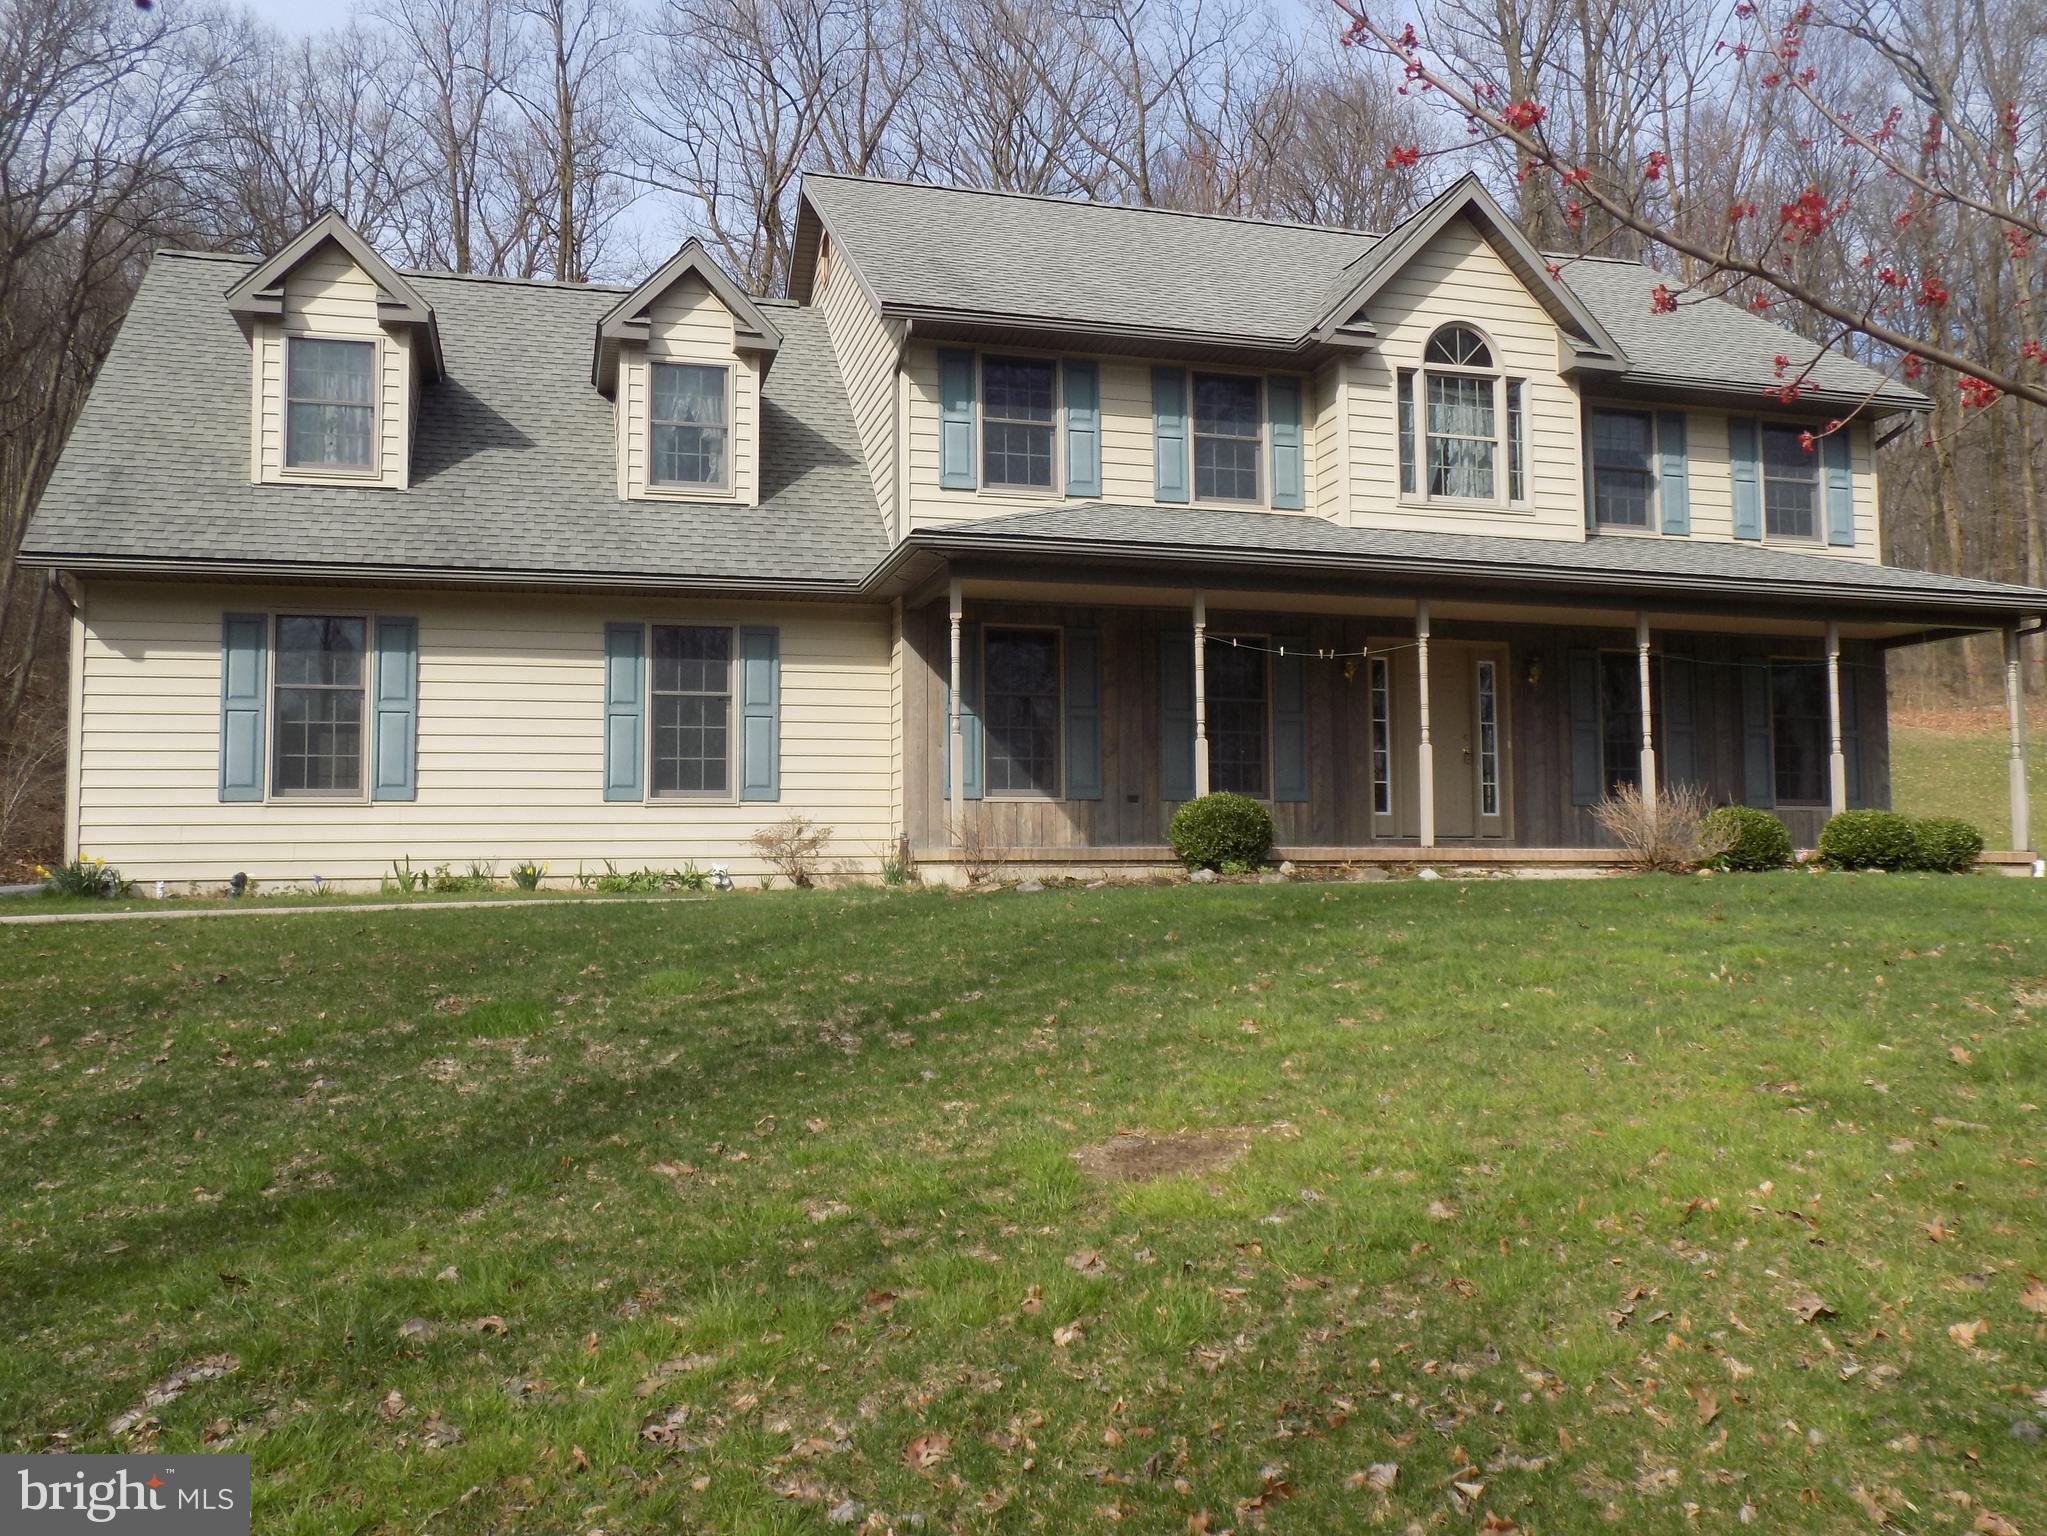 Residential for sale in BETHEL, Pennsylvania, PABK326078